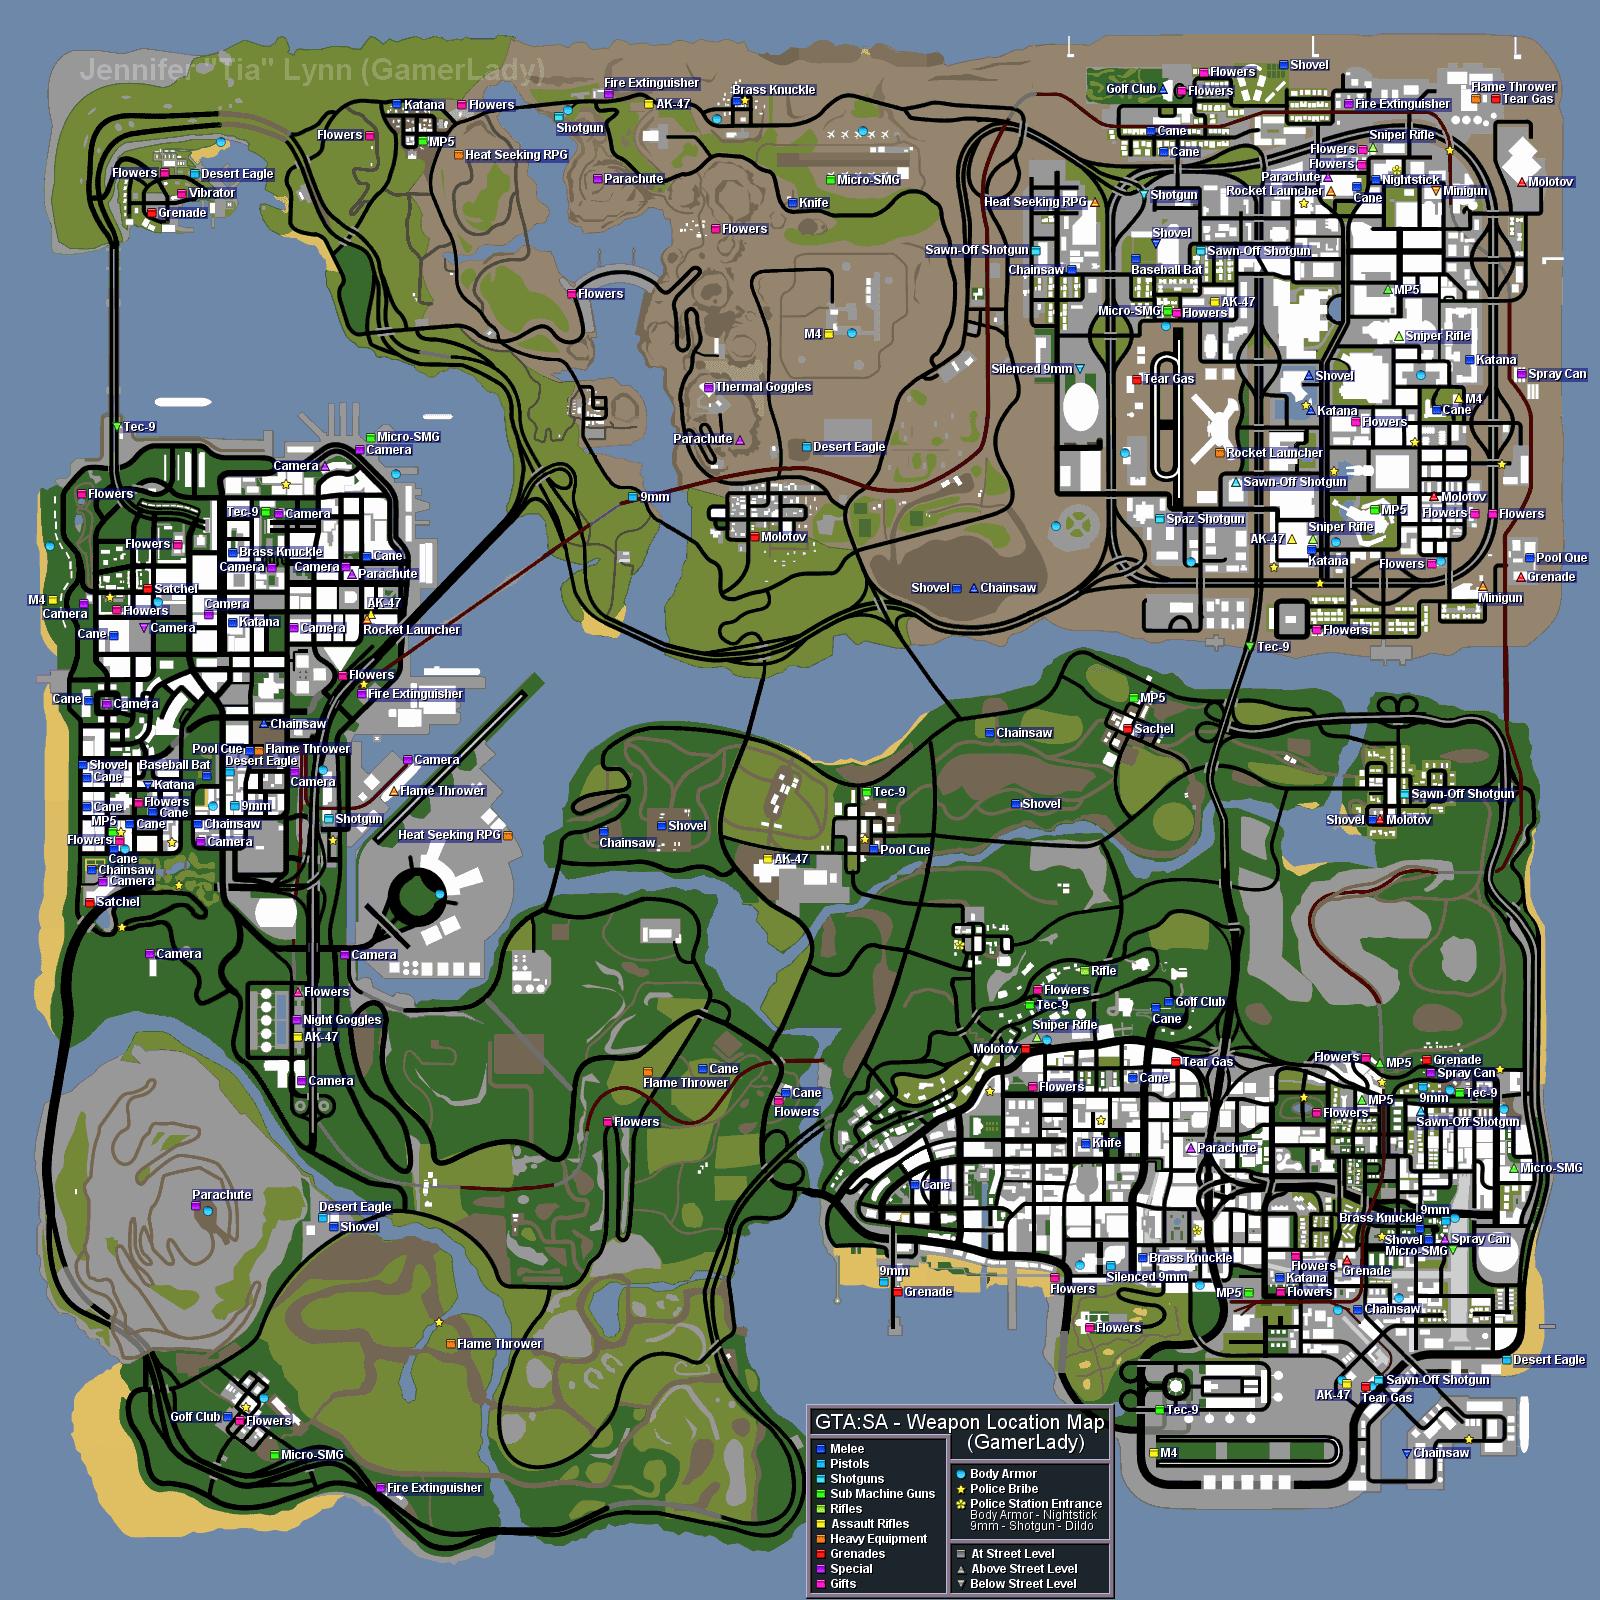 Gta San Andreas Map Locations